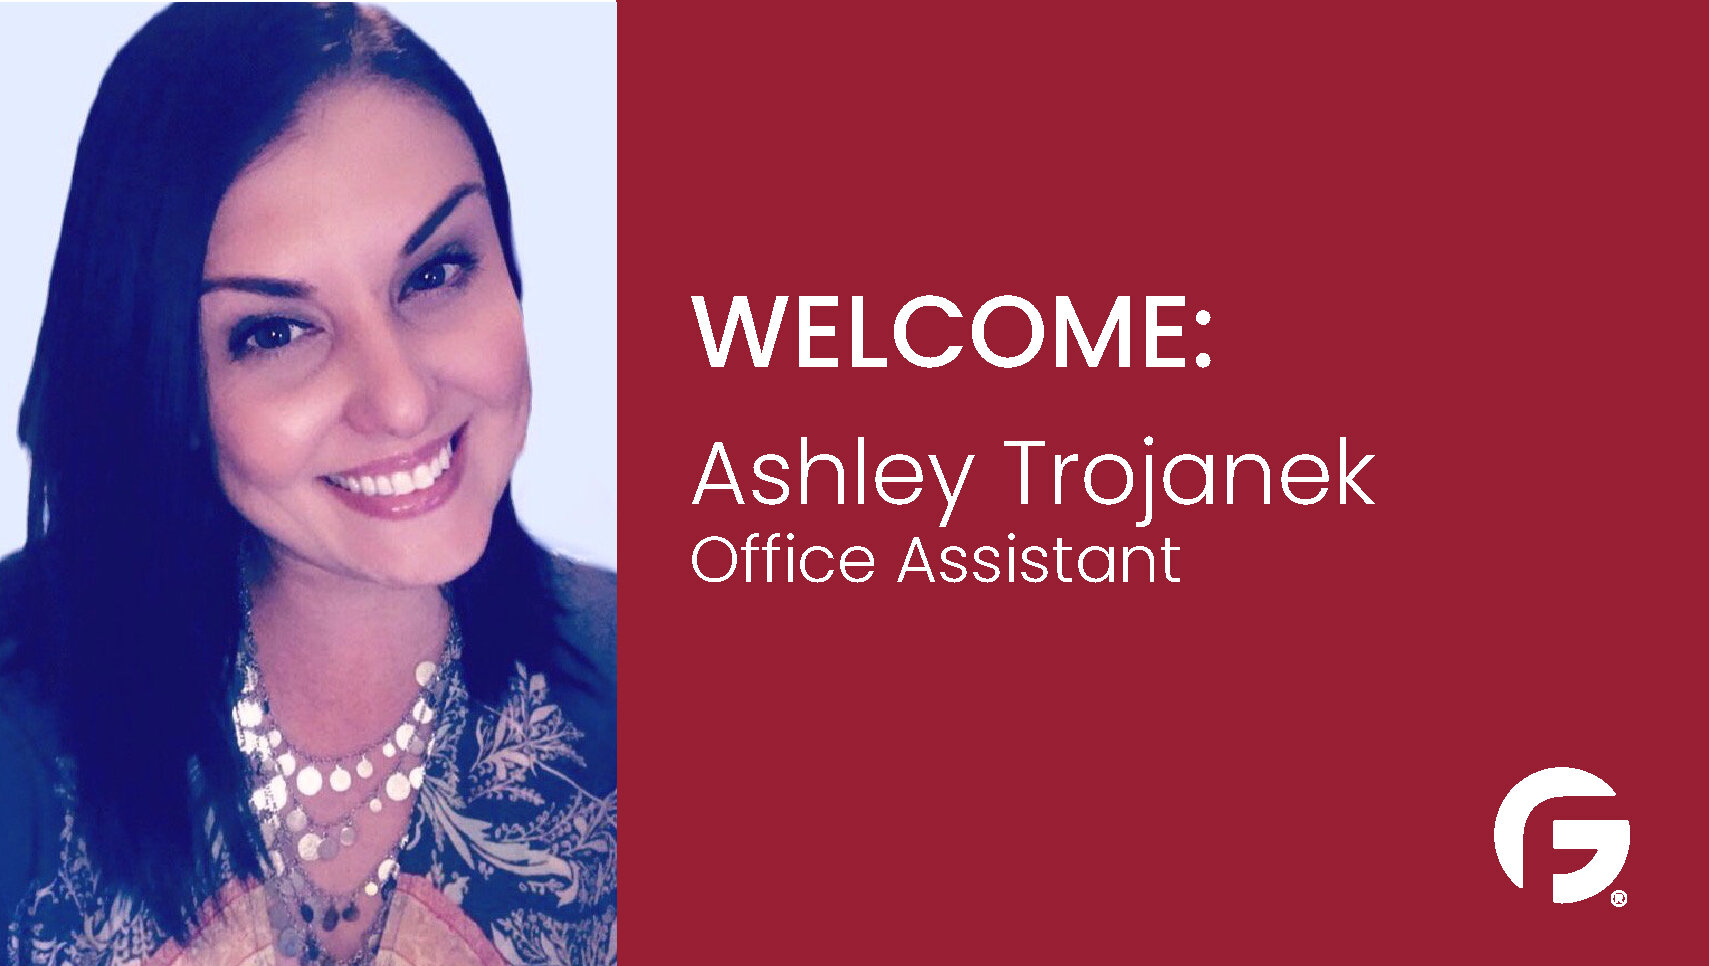 Ashley Trojanek Phoenix Arizona